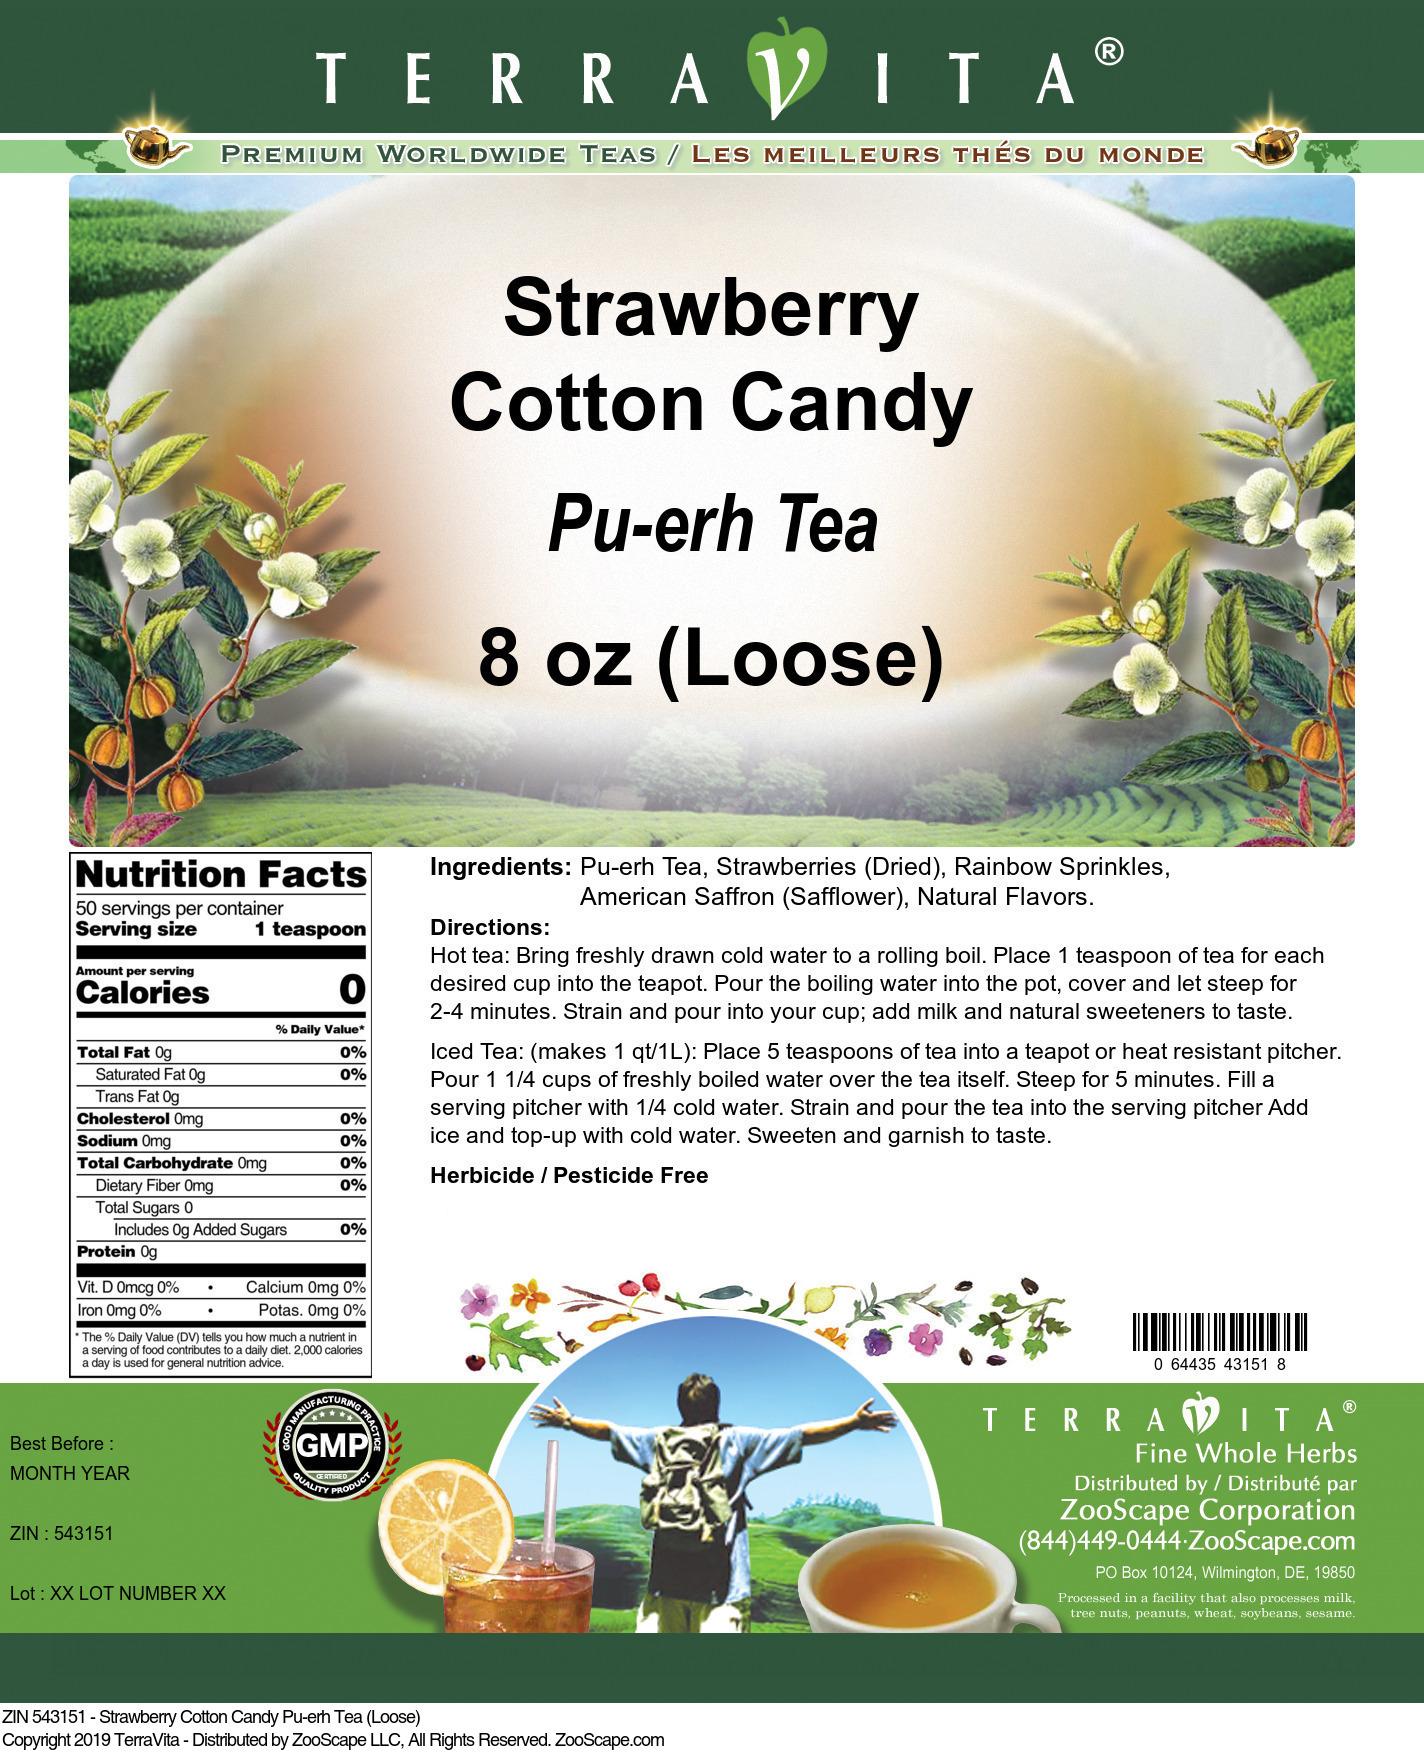 Strawberry Cotton Candy Pu-erh Tea (Loose)